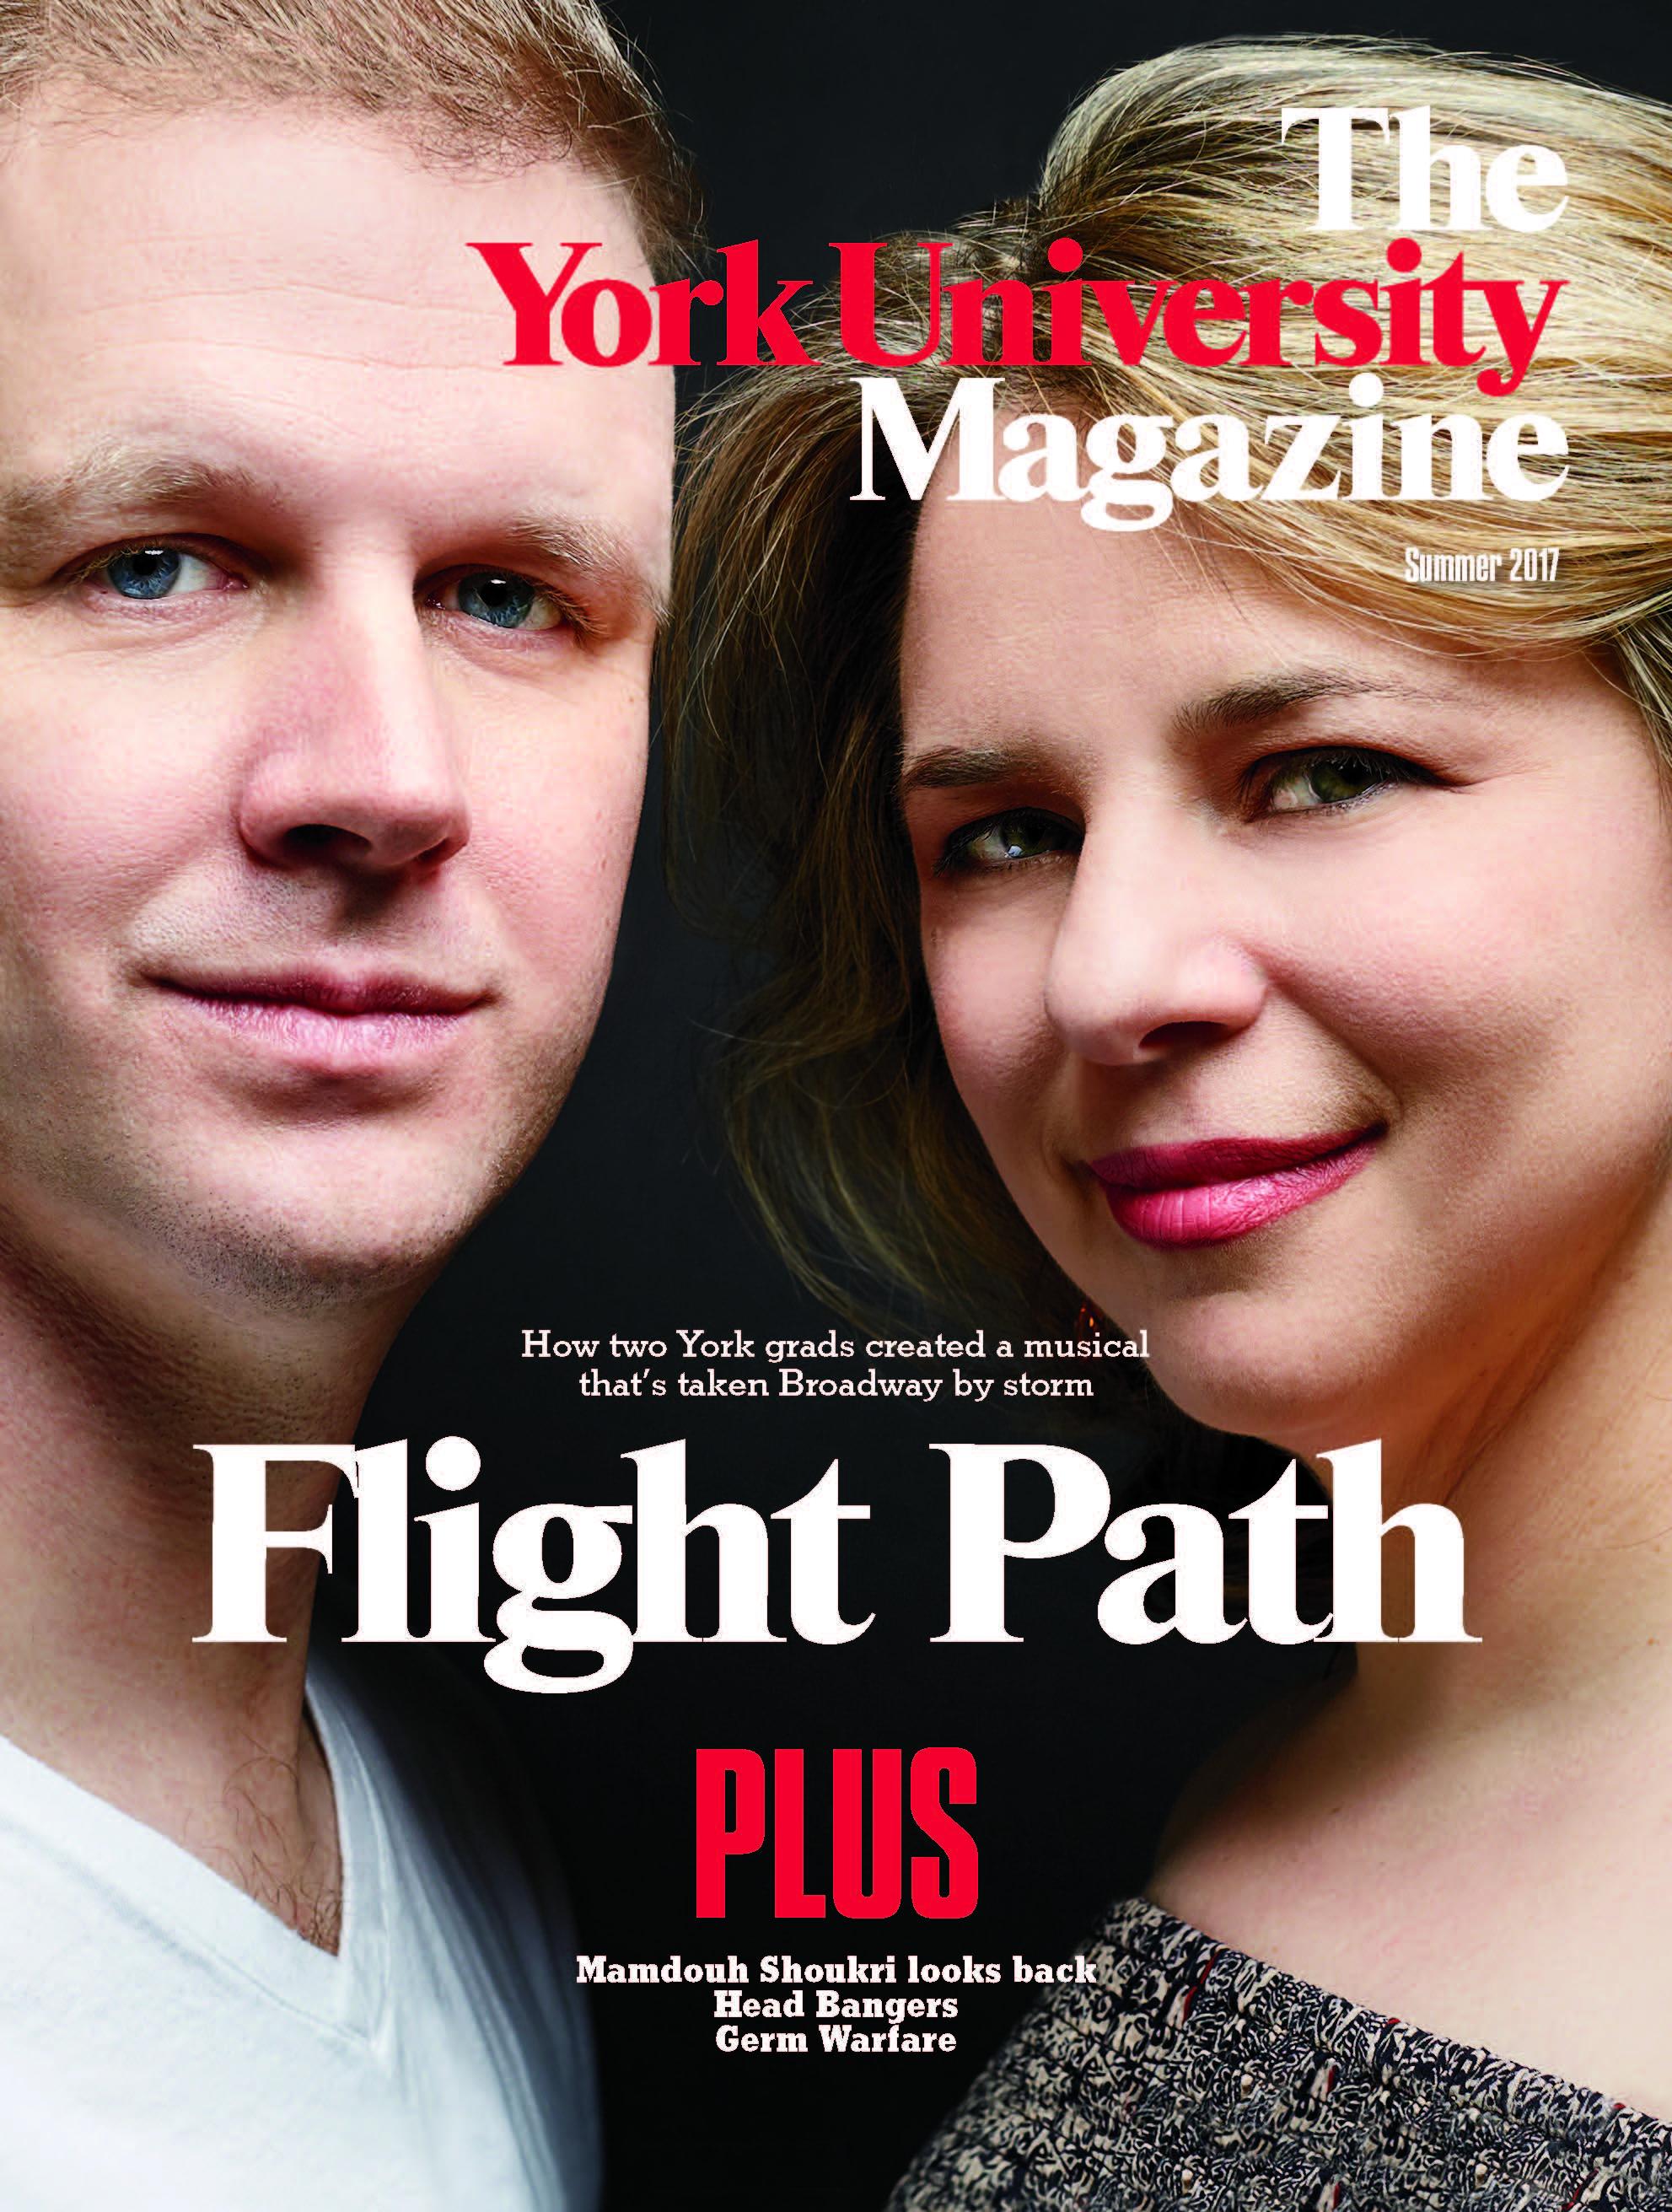 YorkU Summer magazine cover